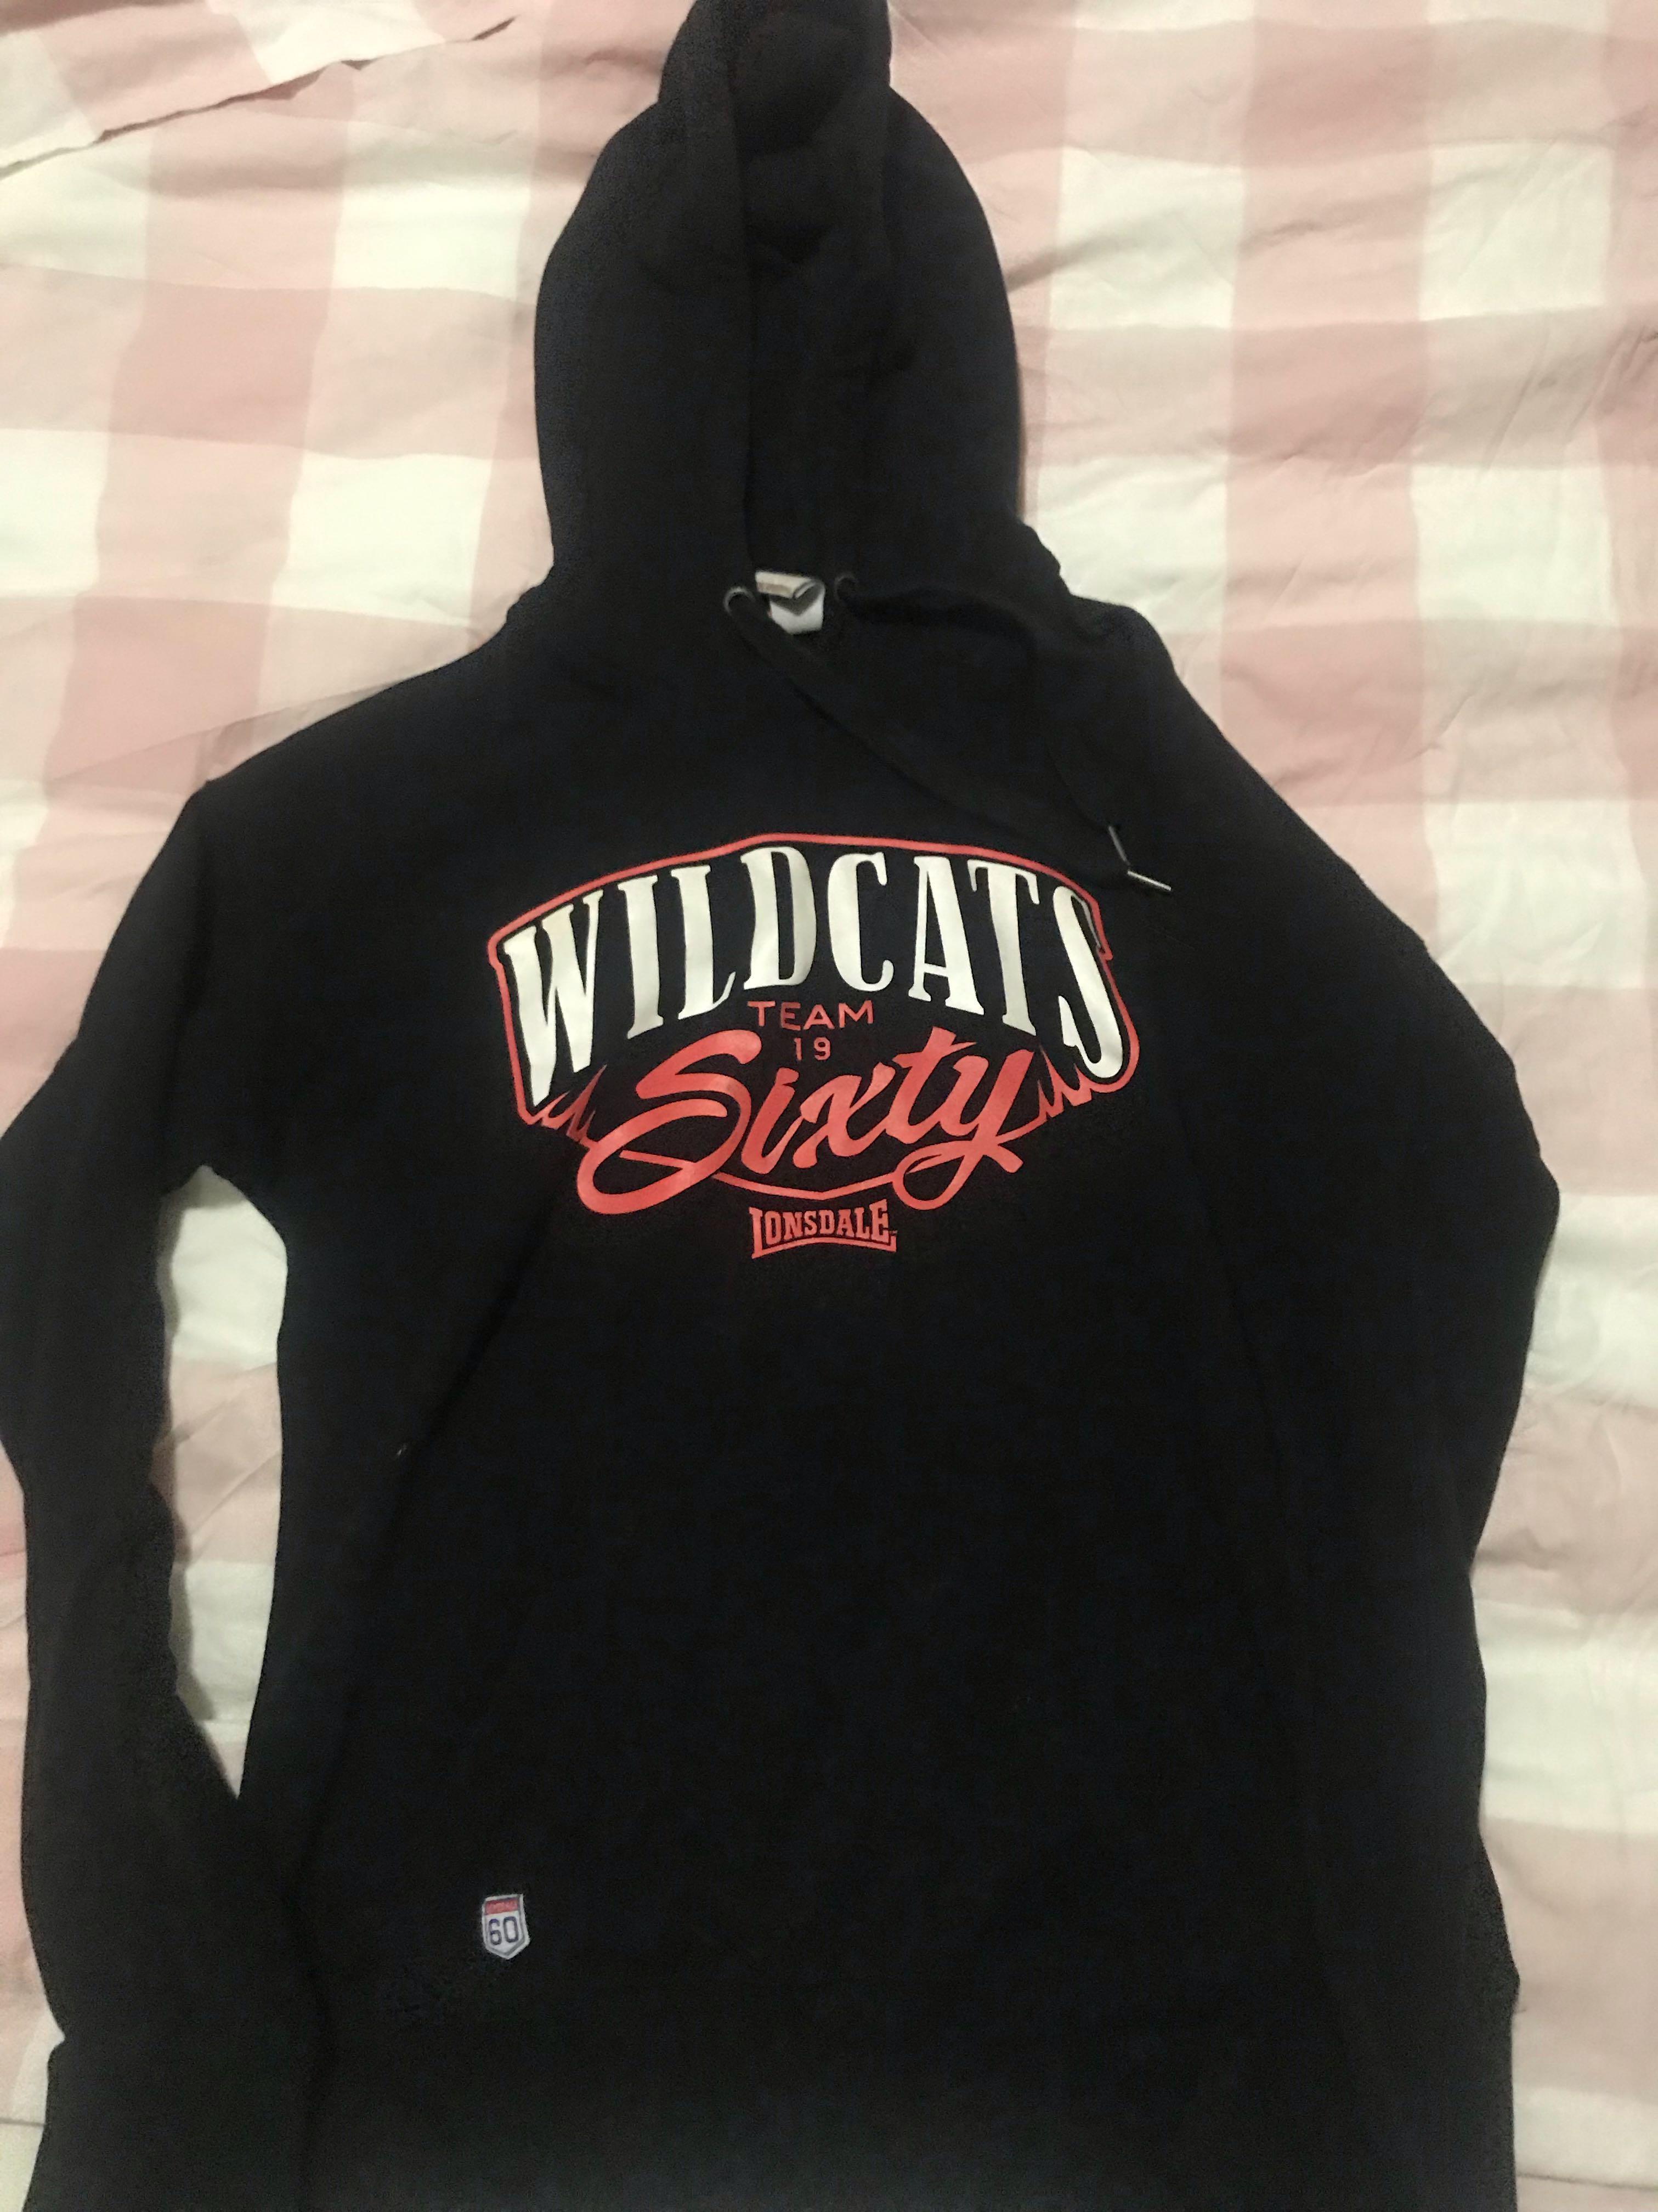 Wildcats Londsdale hoodie